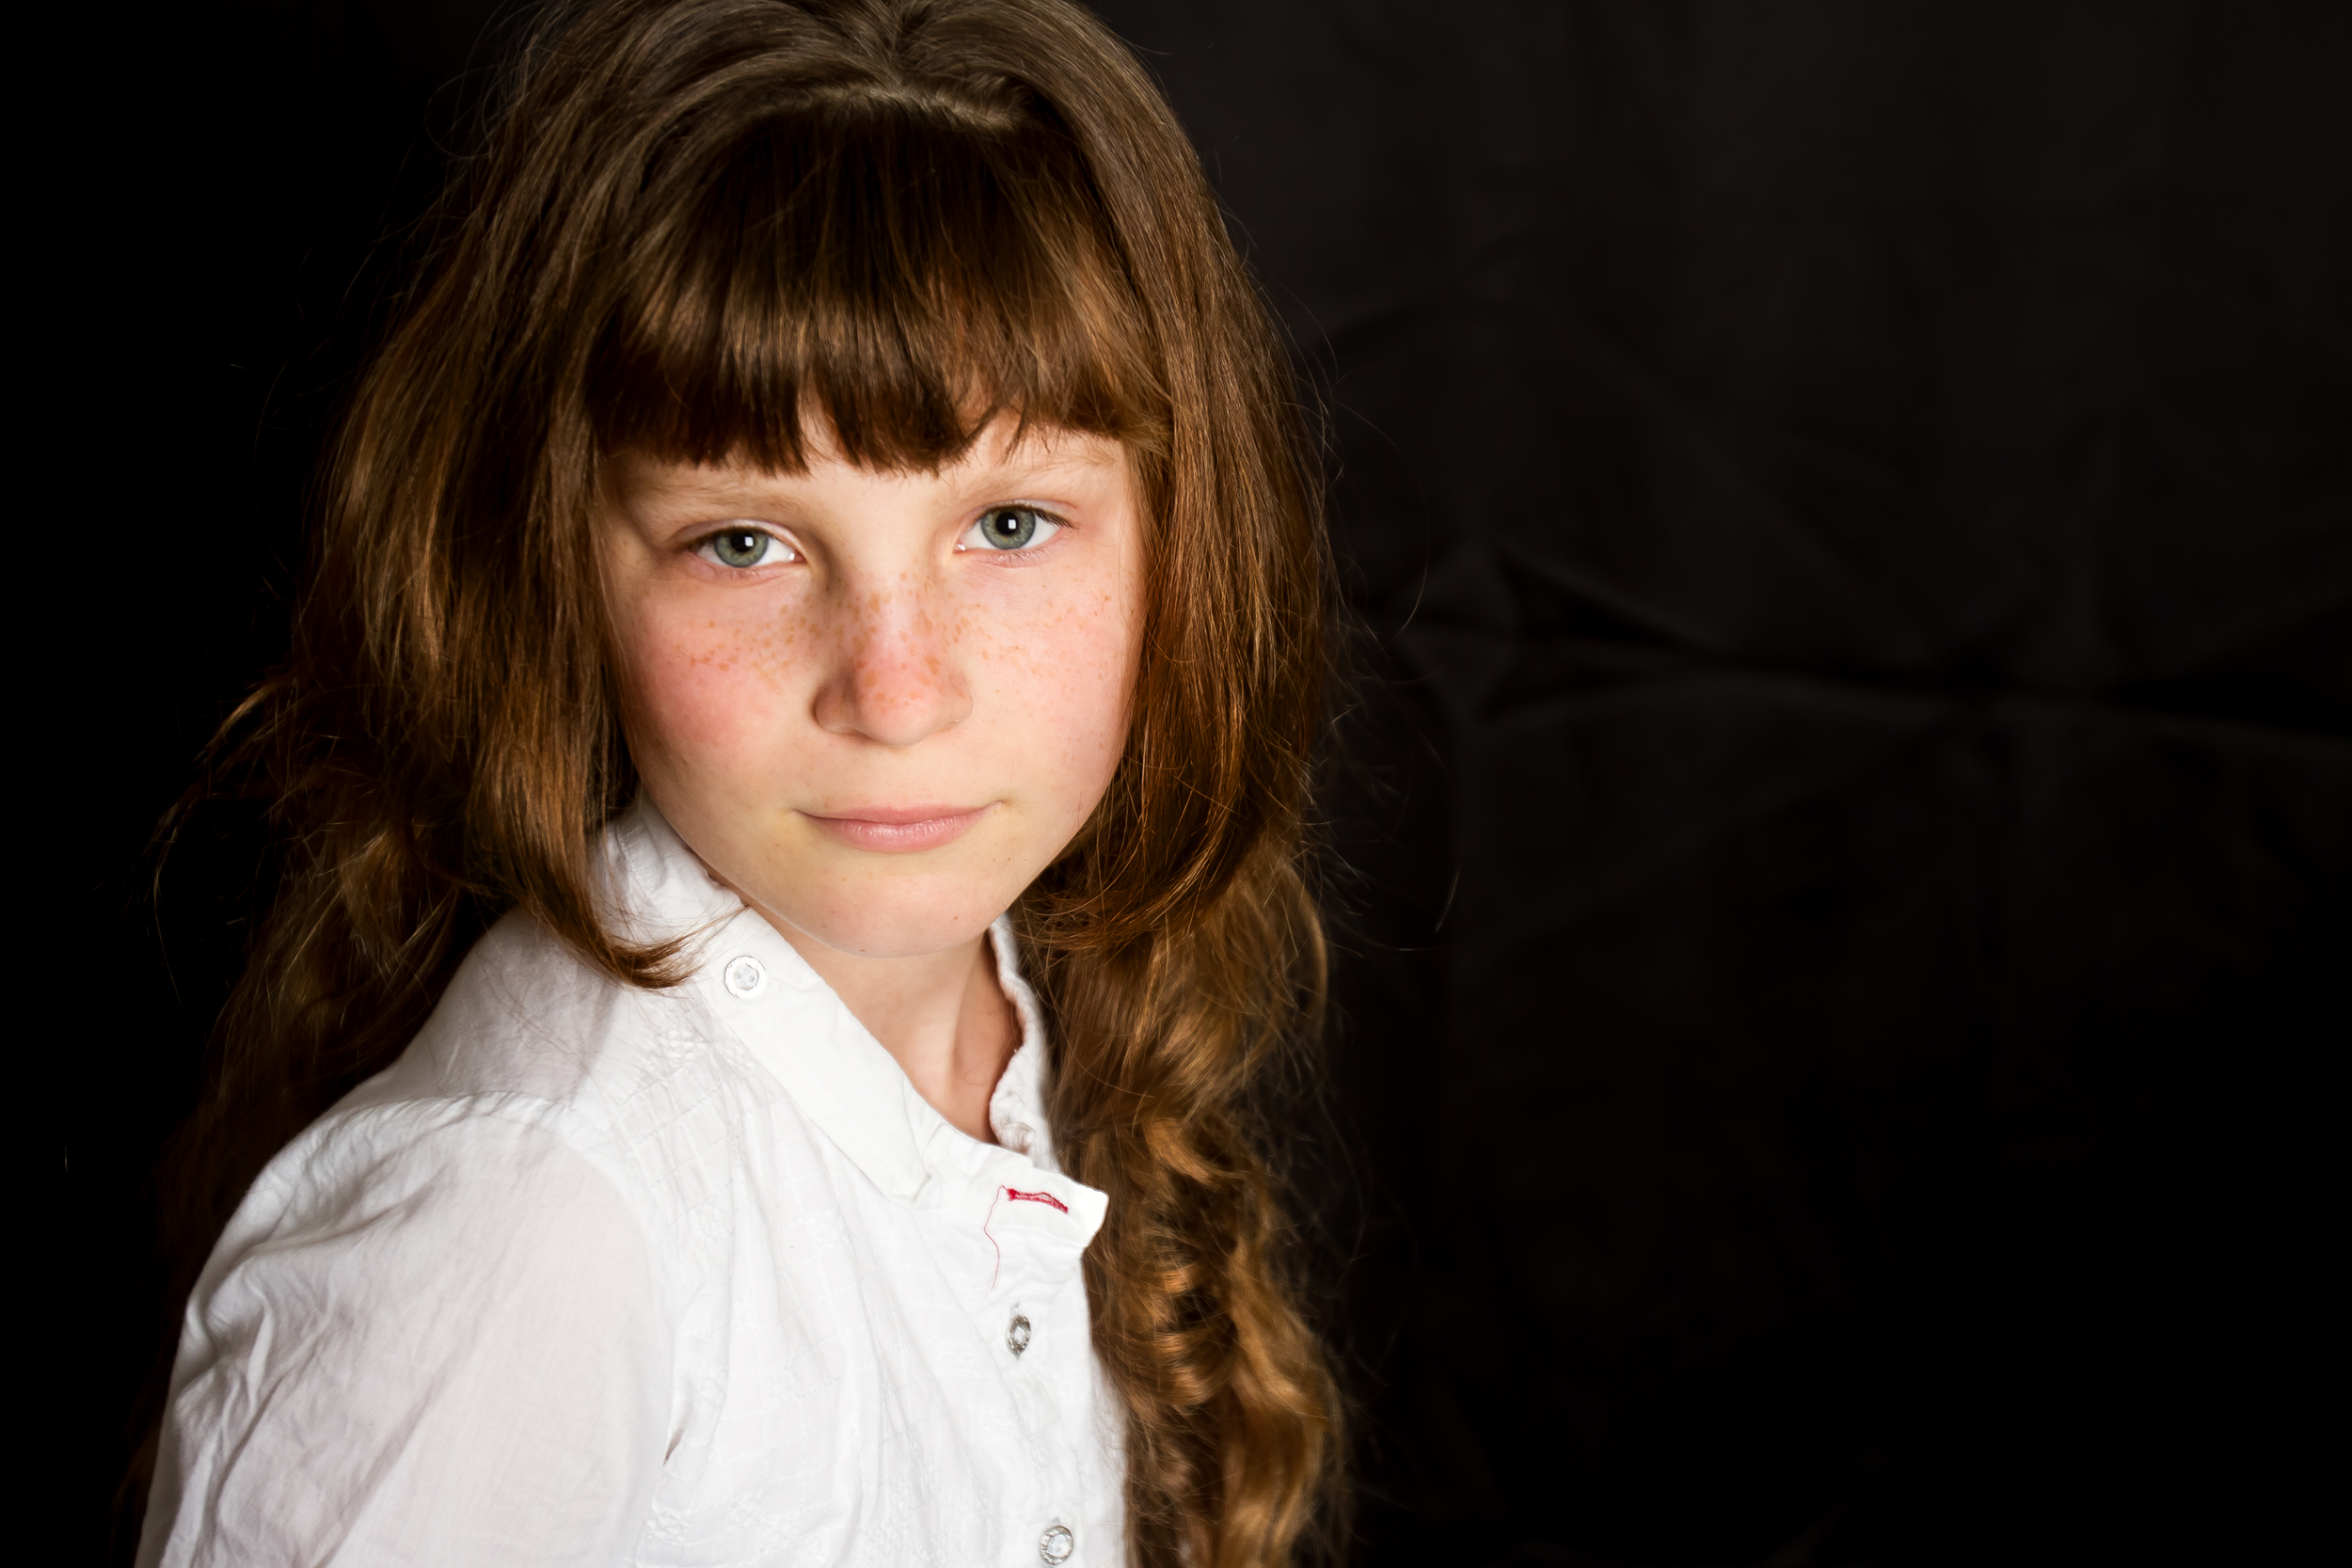 studio portrait of a child girl